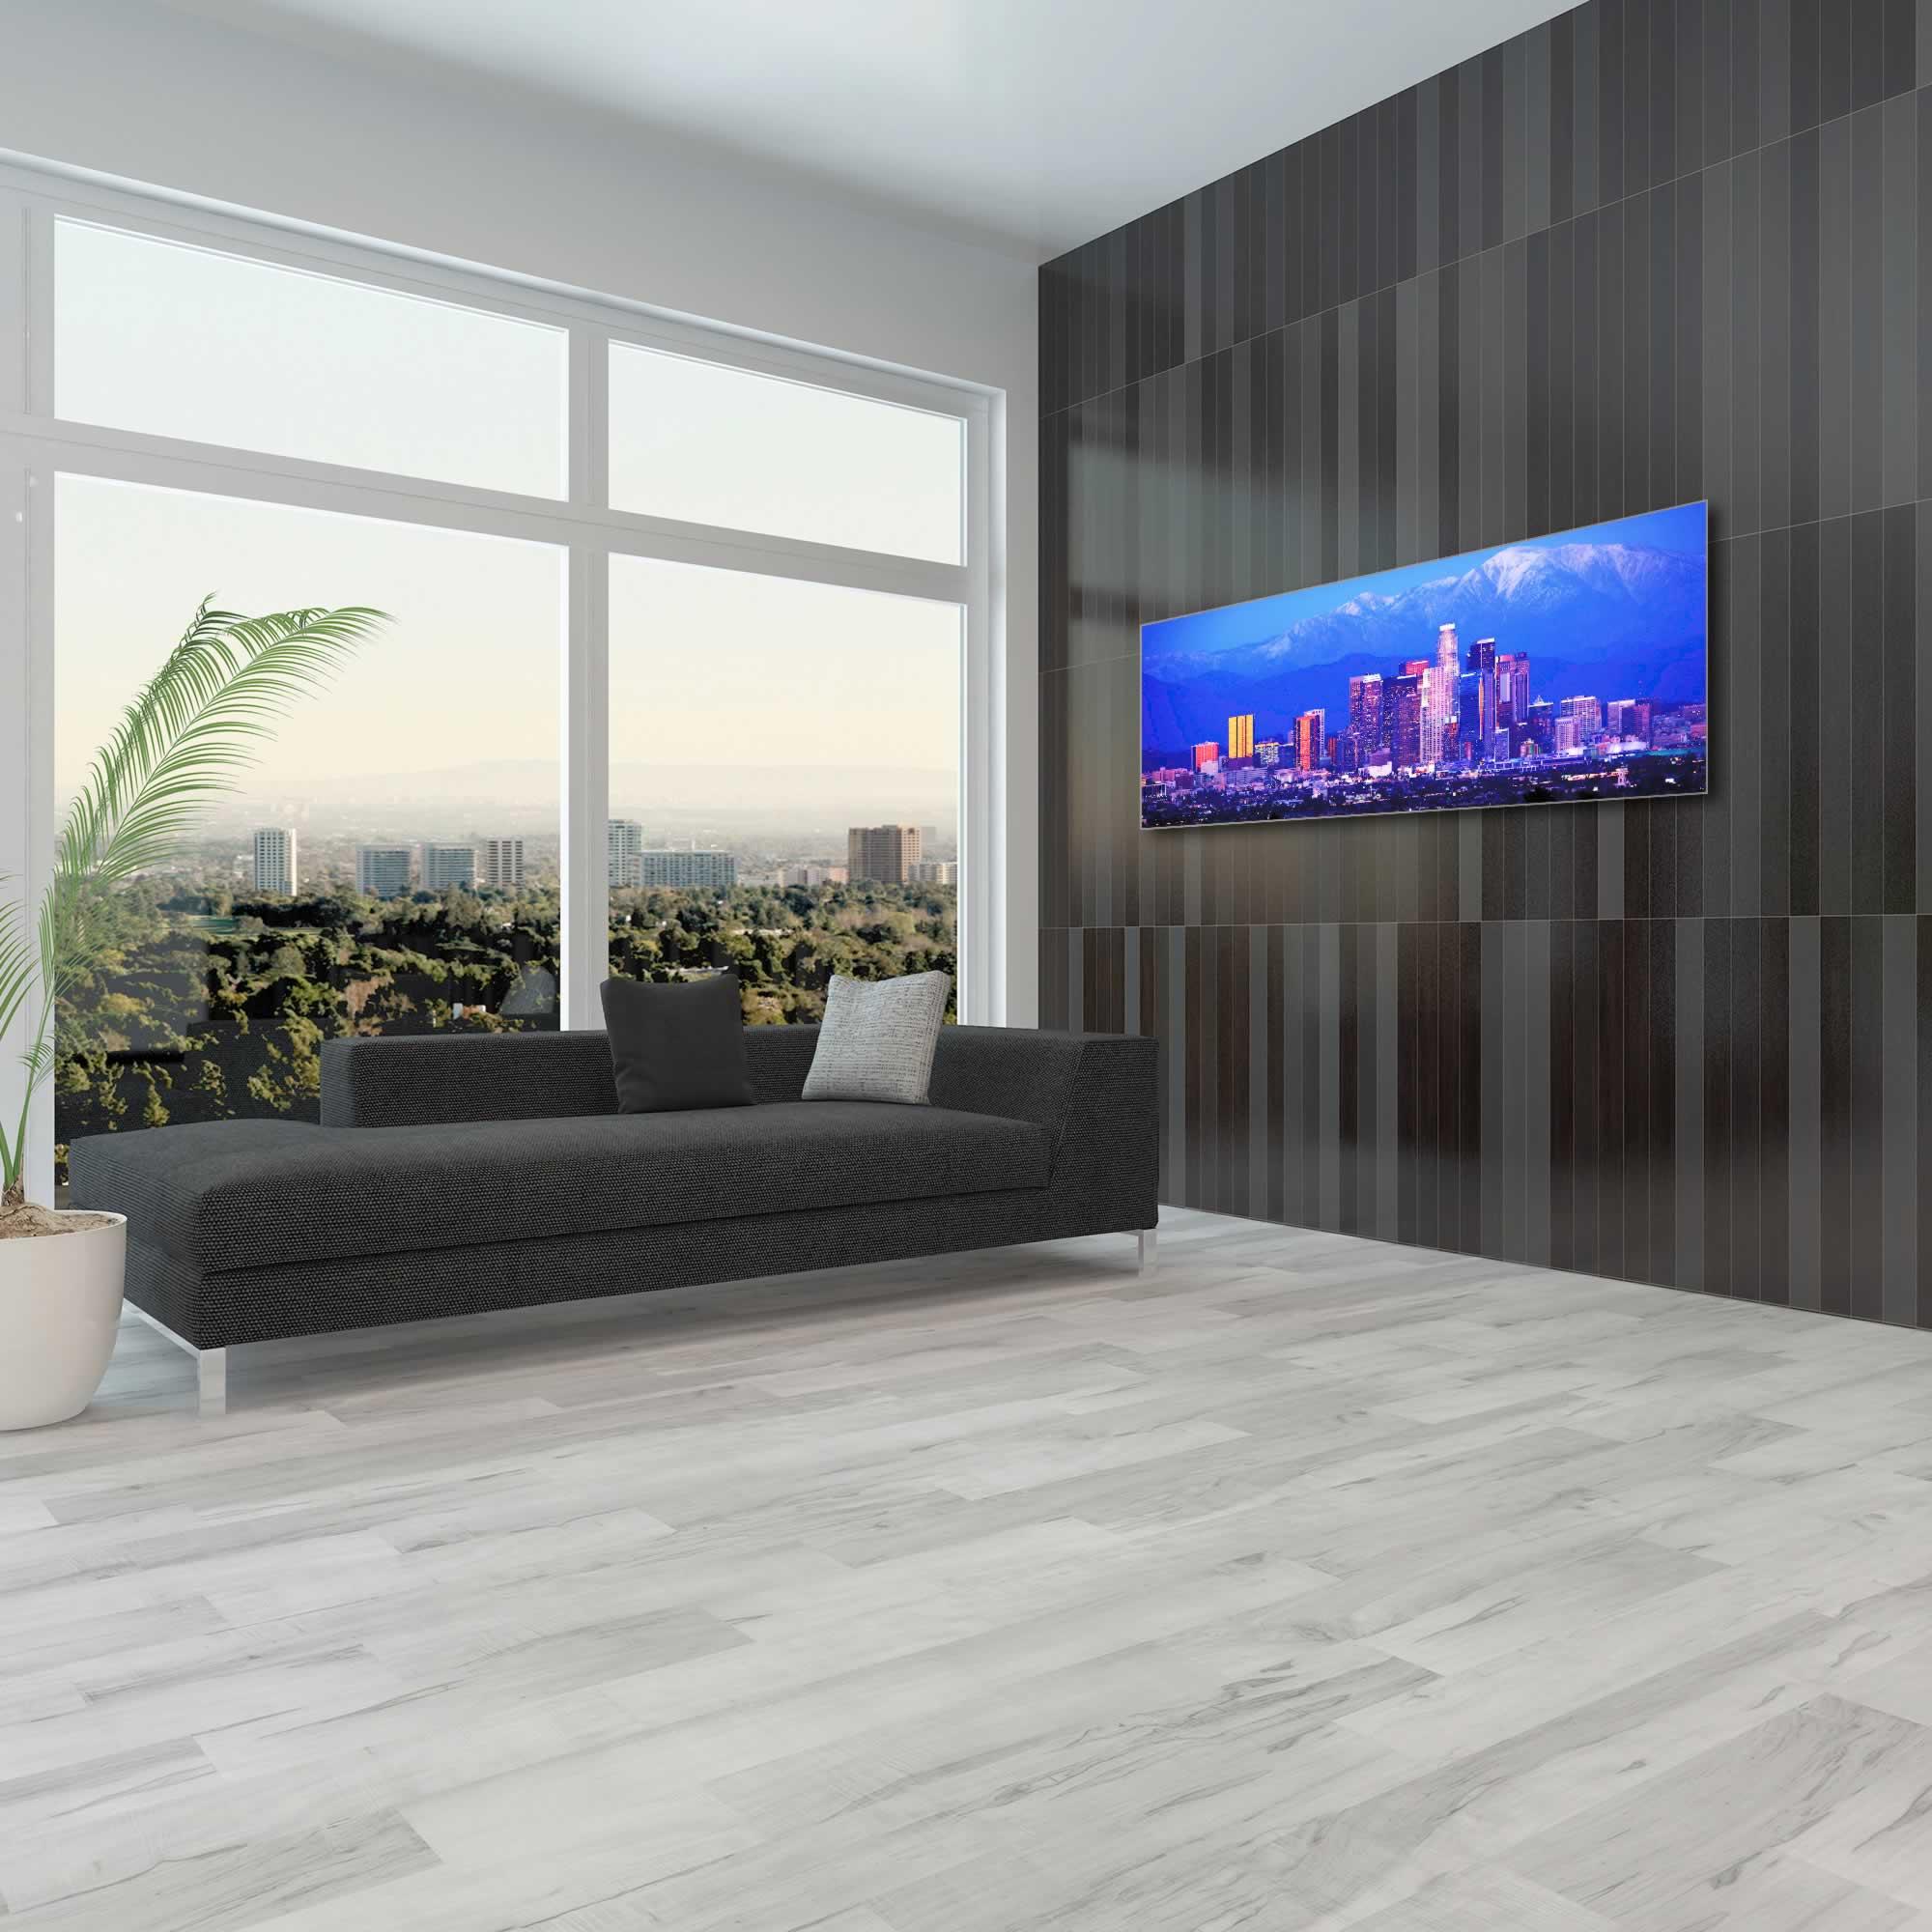 Los Angeles City Skyline - Urban Modern Art, Designer Home Decor, Cityscape Wall Artwork, Trendy Contemporary Art - Alternate View 1